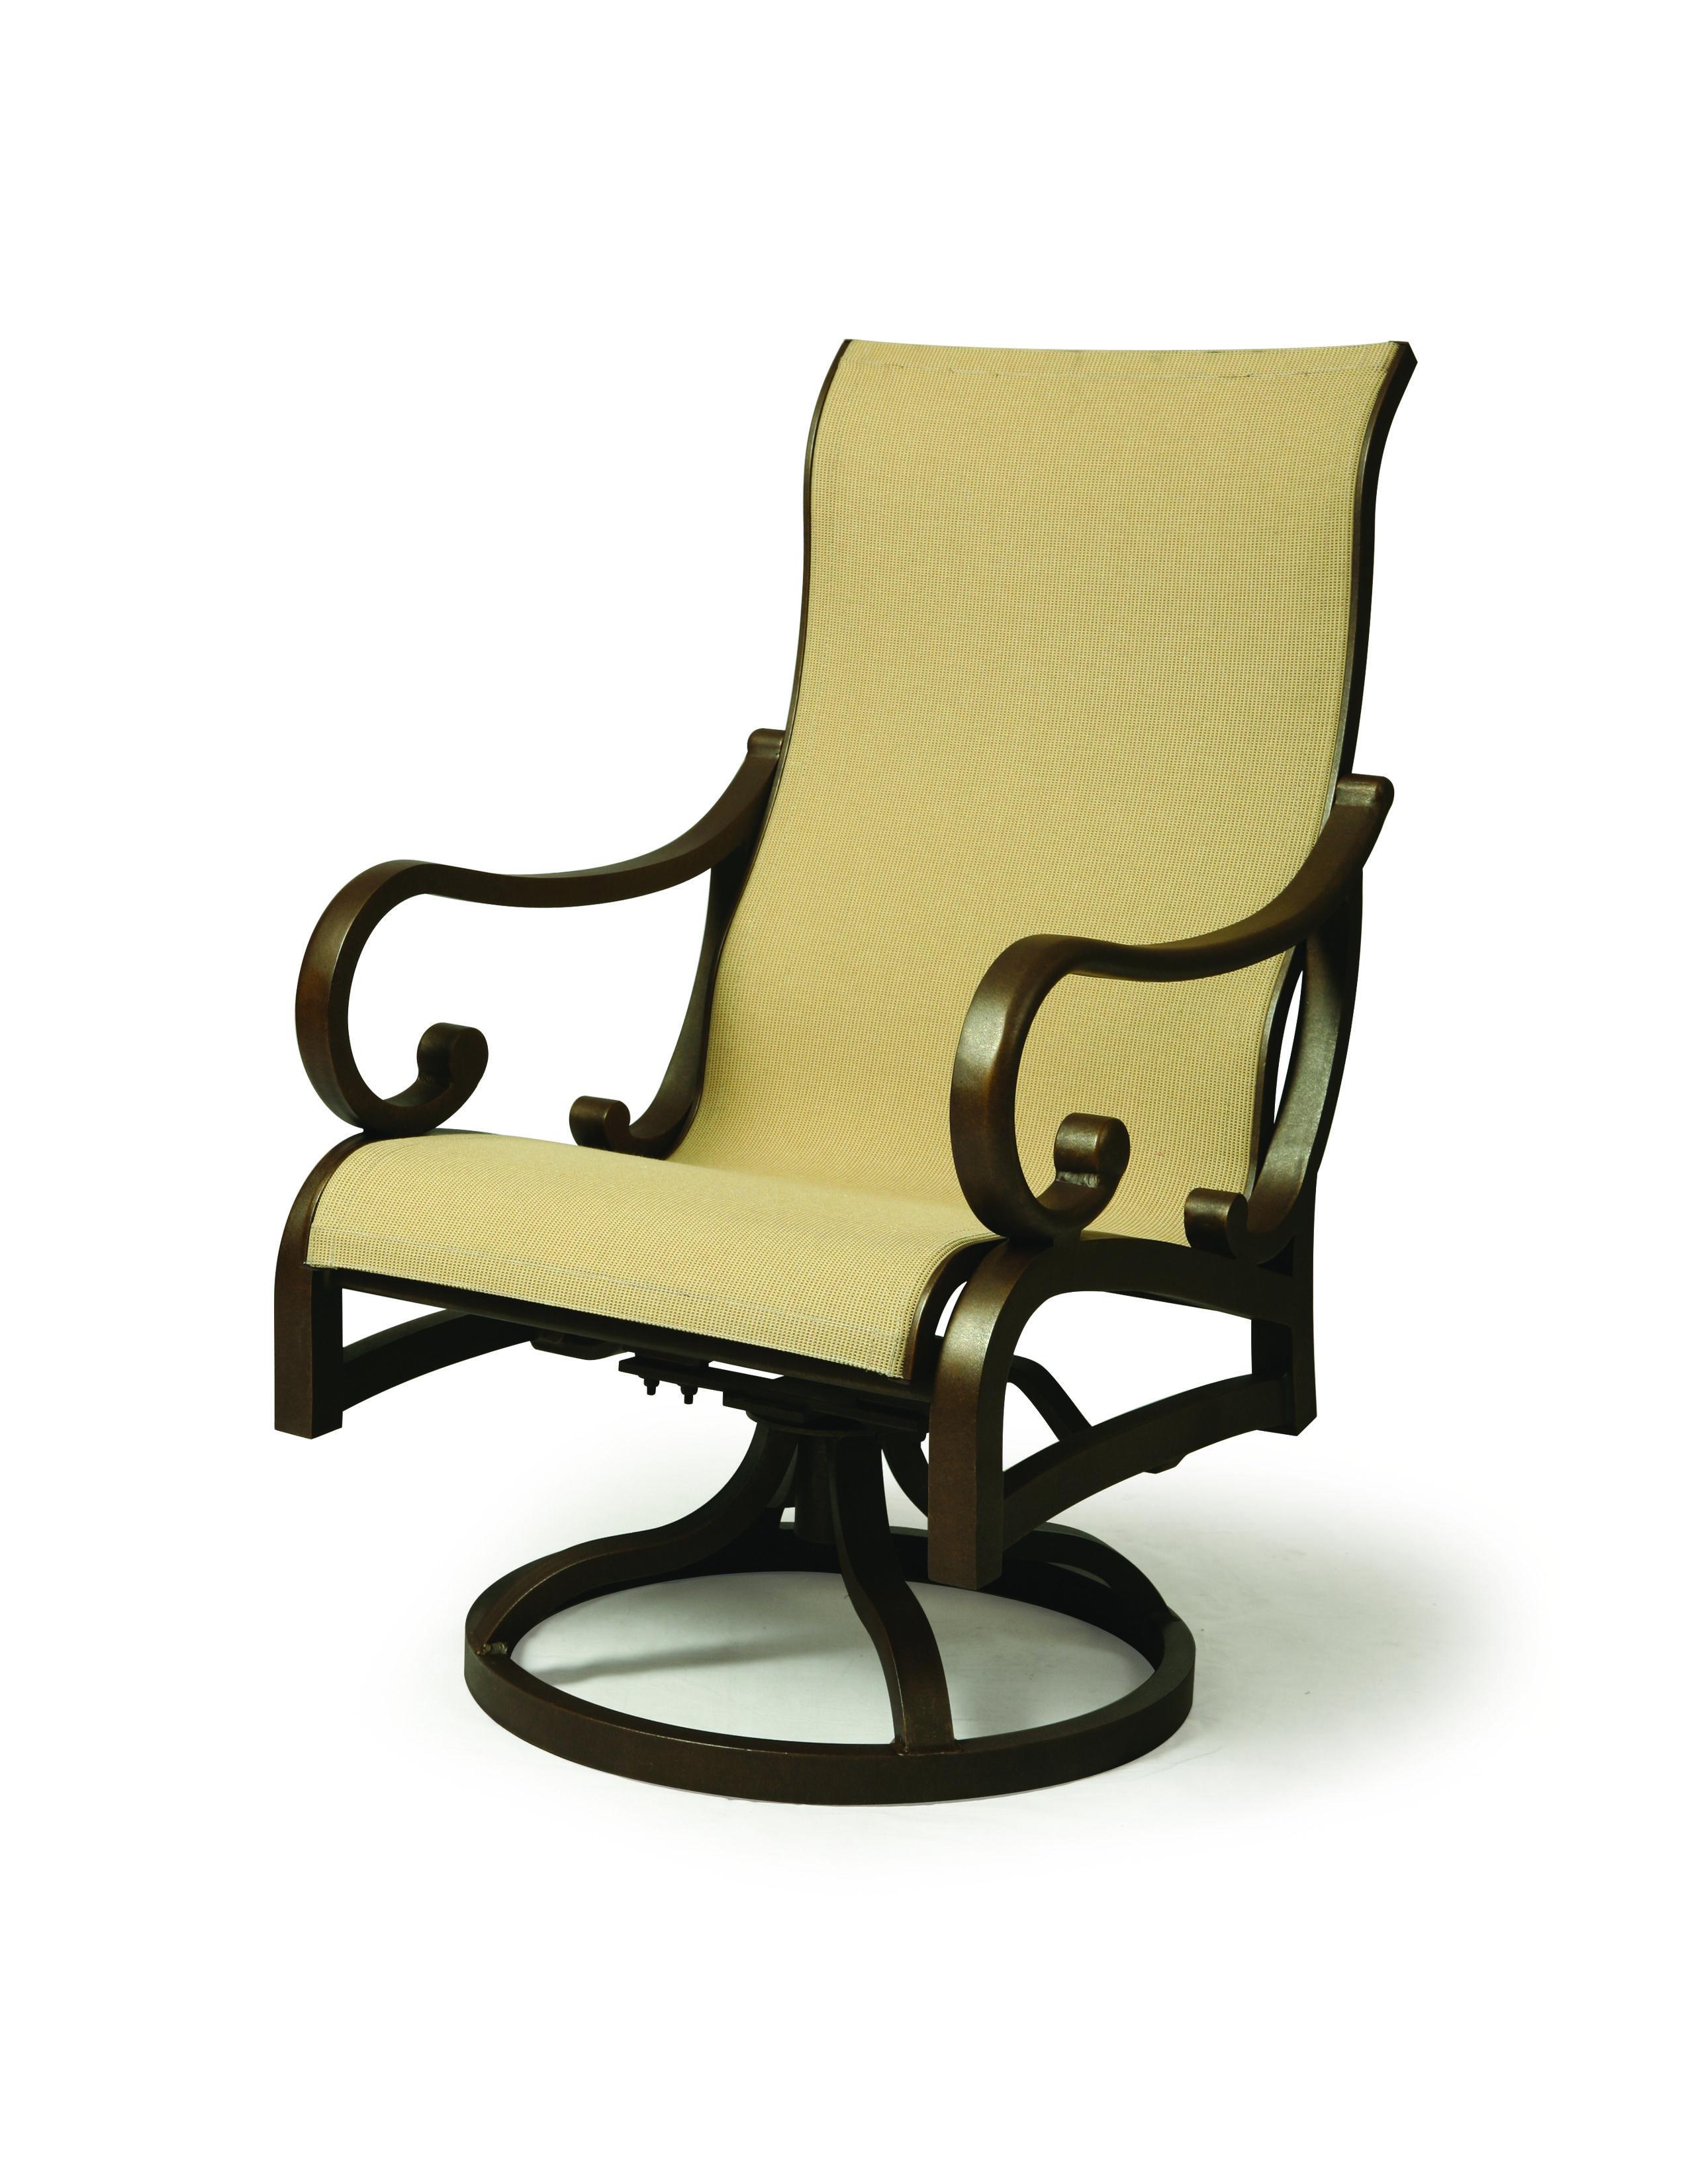 CELAYA SLING SWIVEL ROCKER Outdoor chairs, Outdoor decor